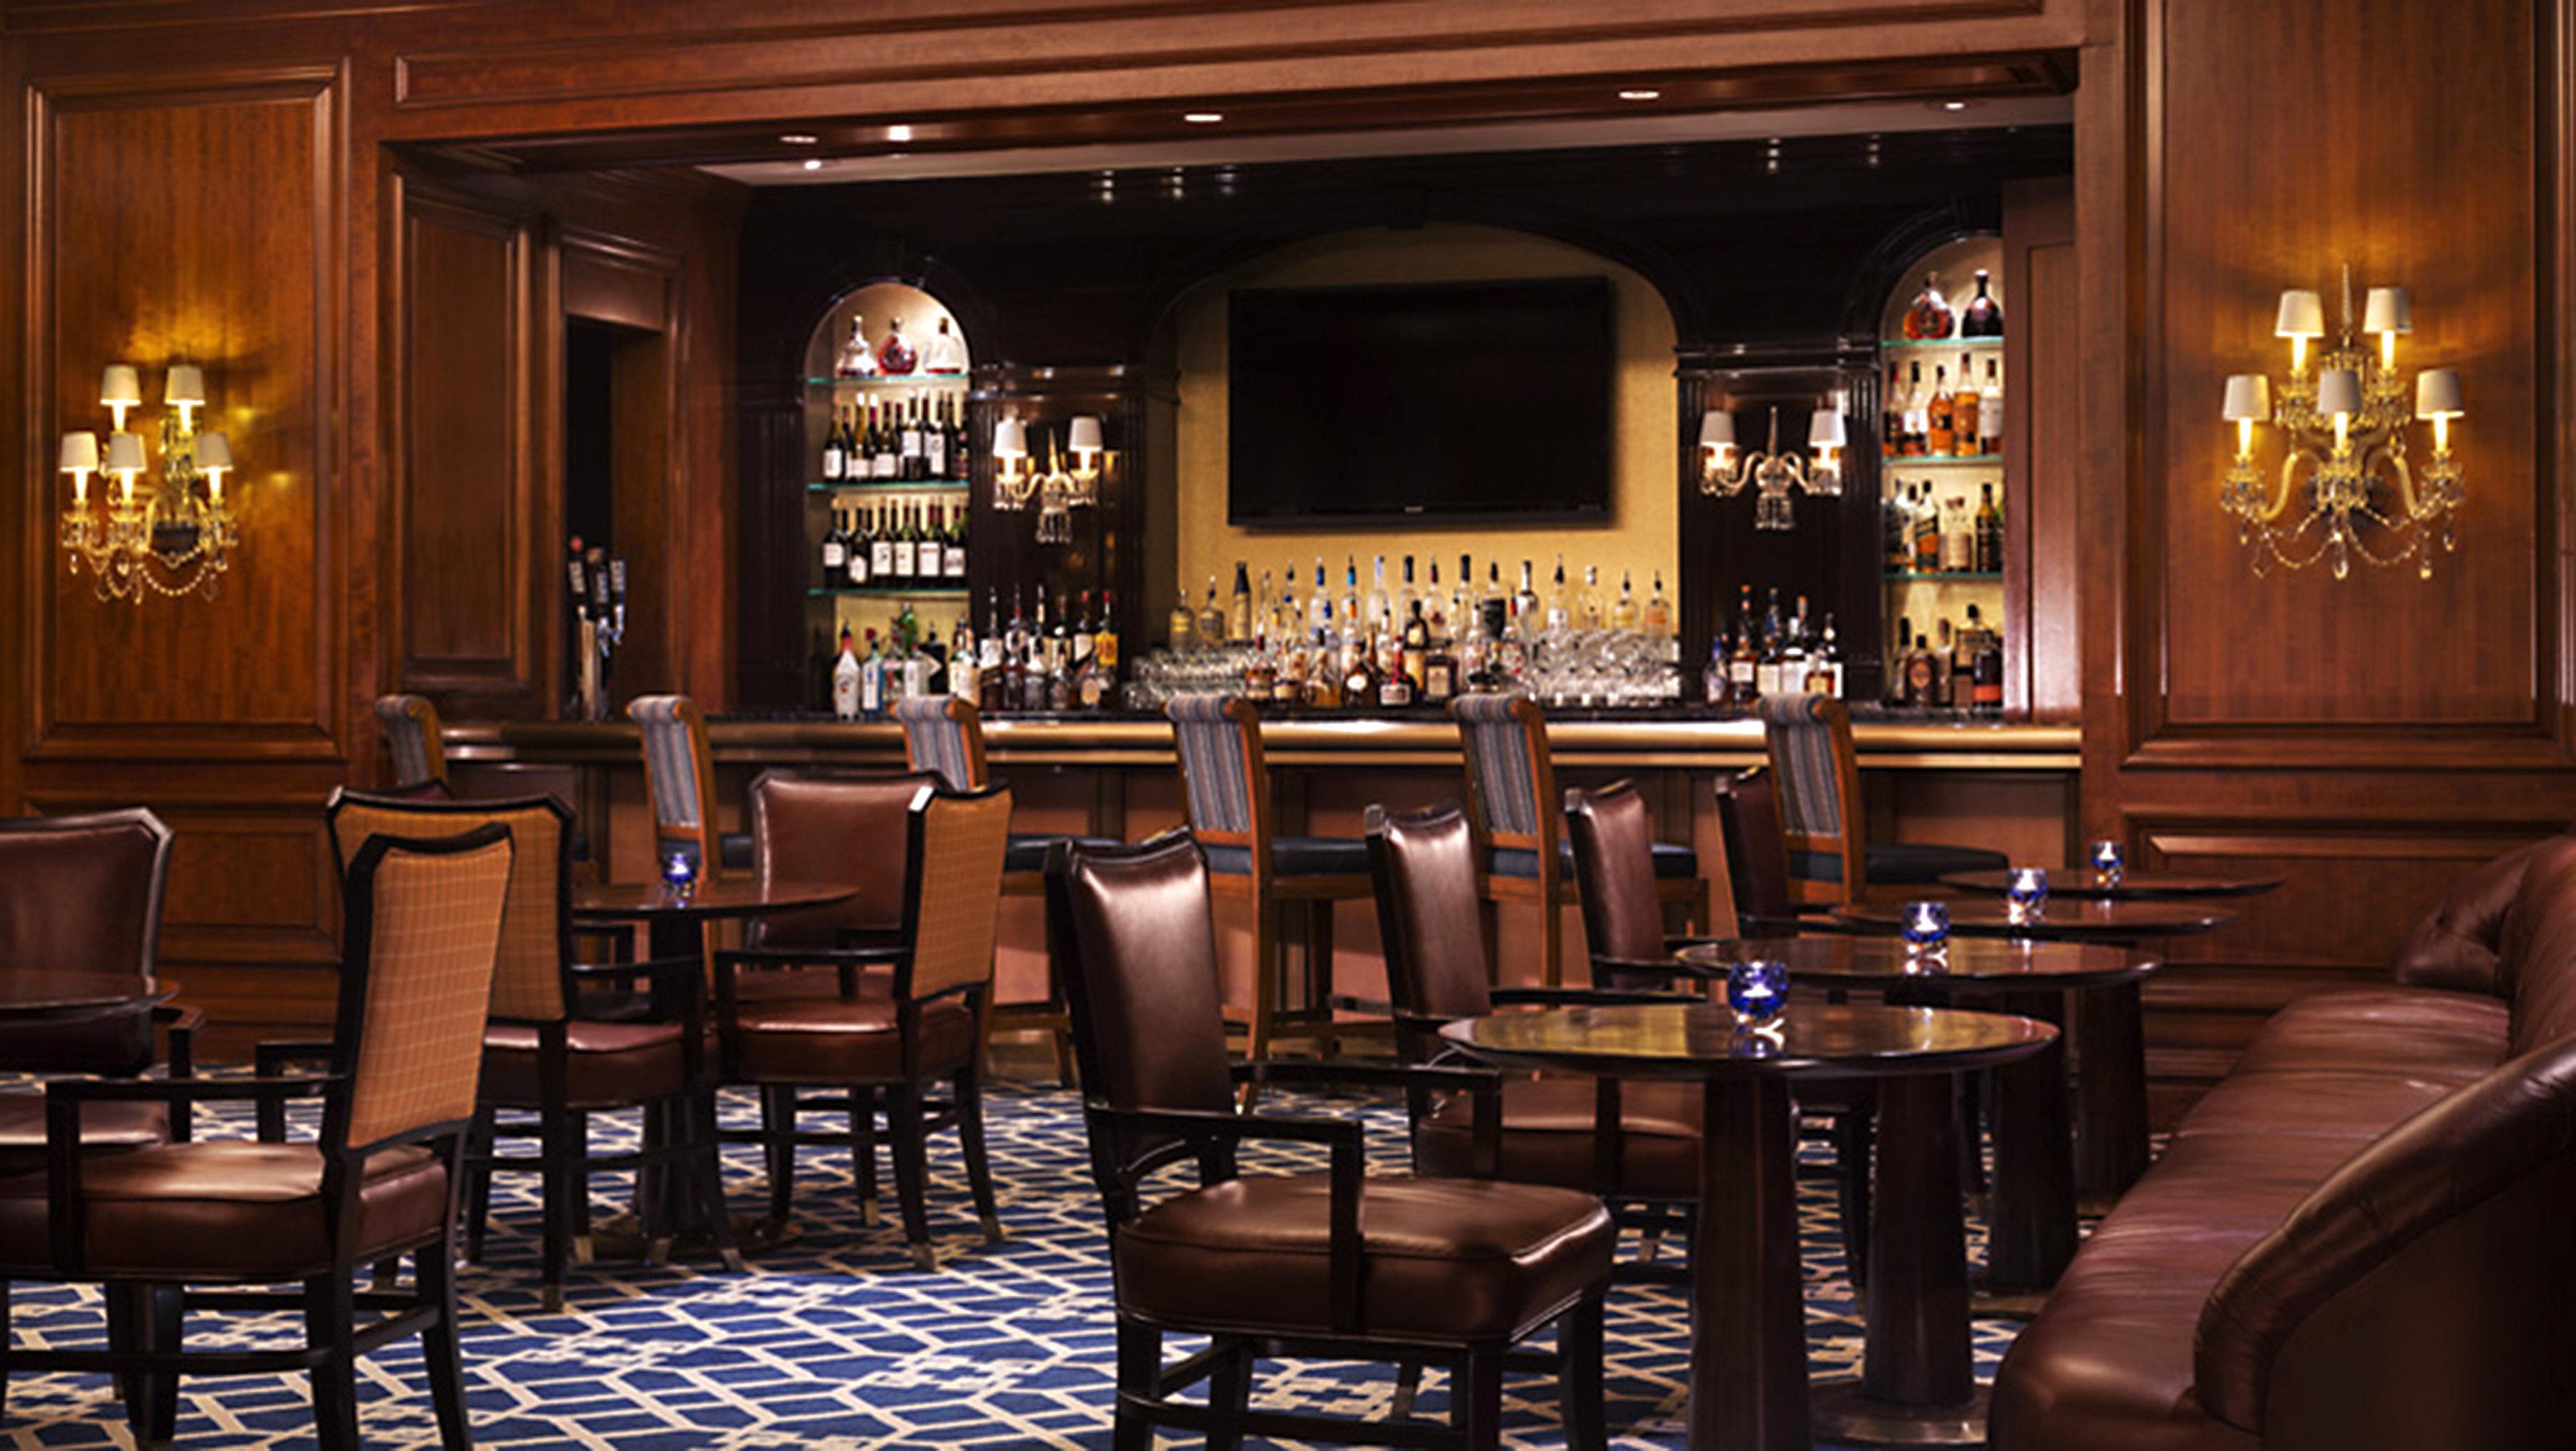 Dining Drink Eat Elegant Luxury chair restaurant Bar function hall ballroom set dining table